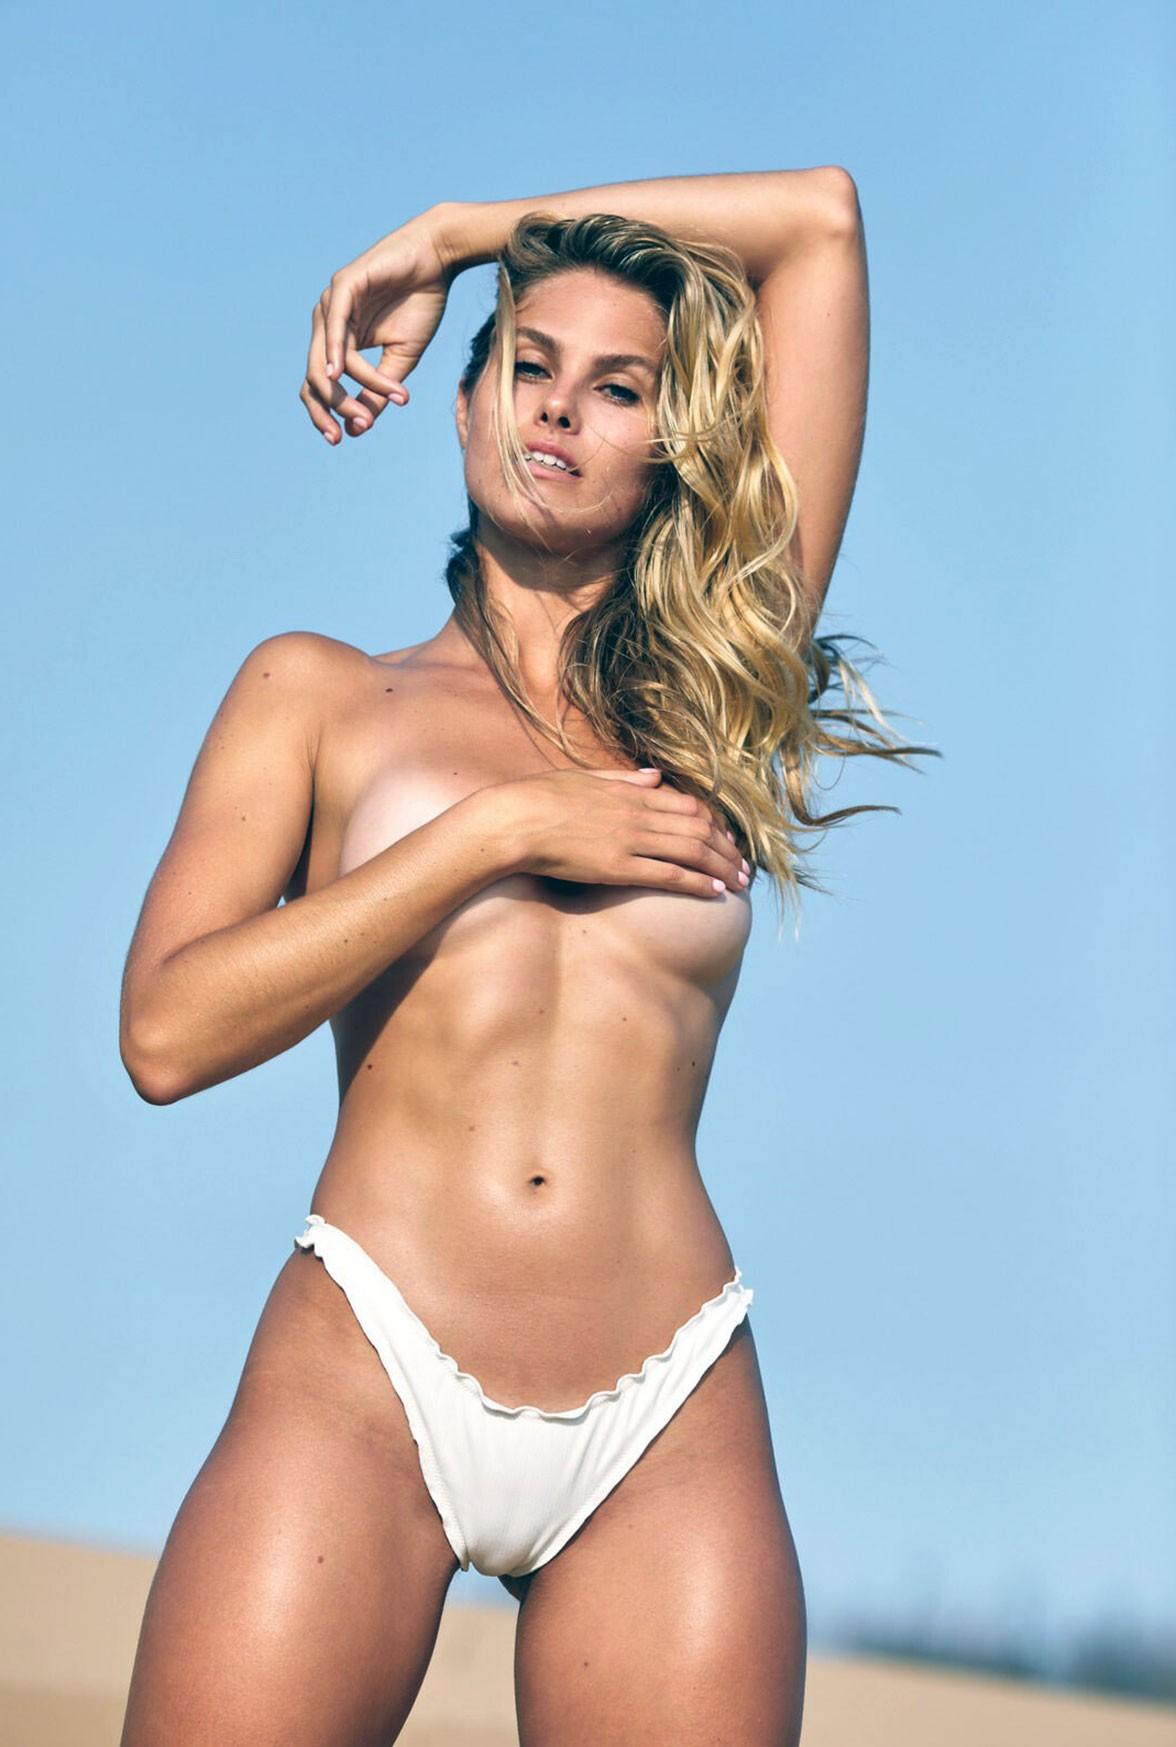 Natalie Roser tits